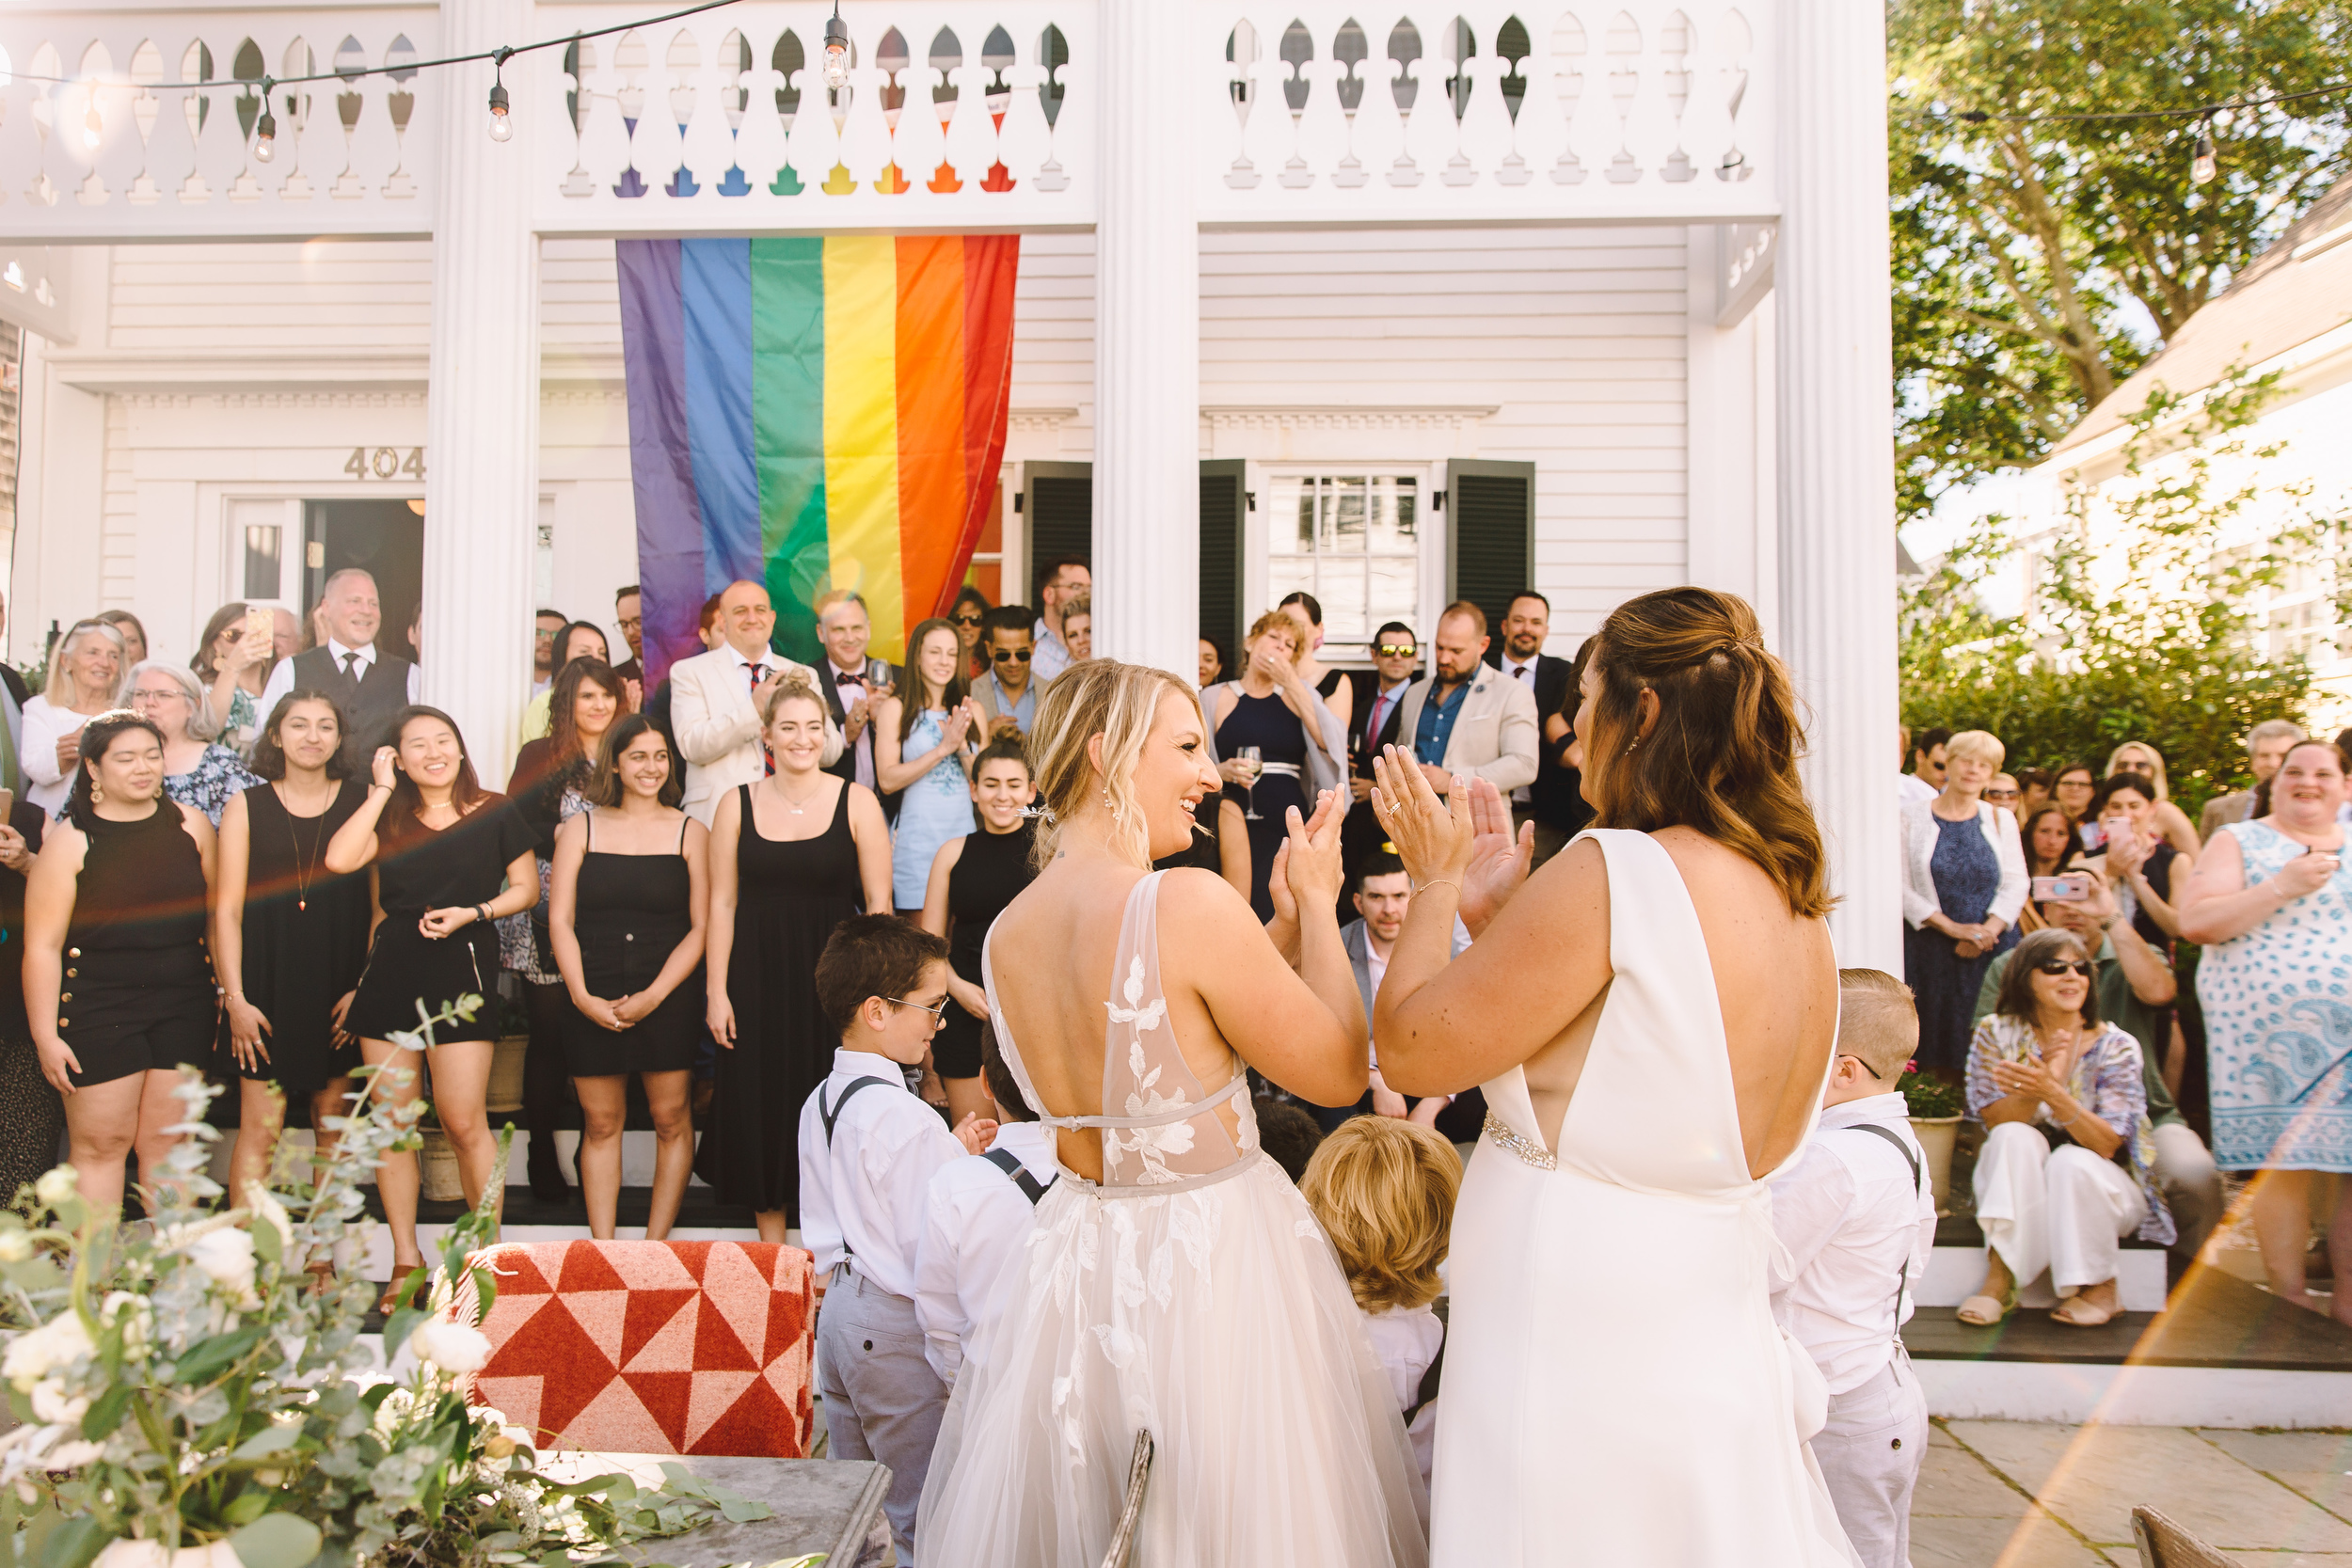 provincetown_same_sex_downtown_wedding_35.JPG